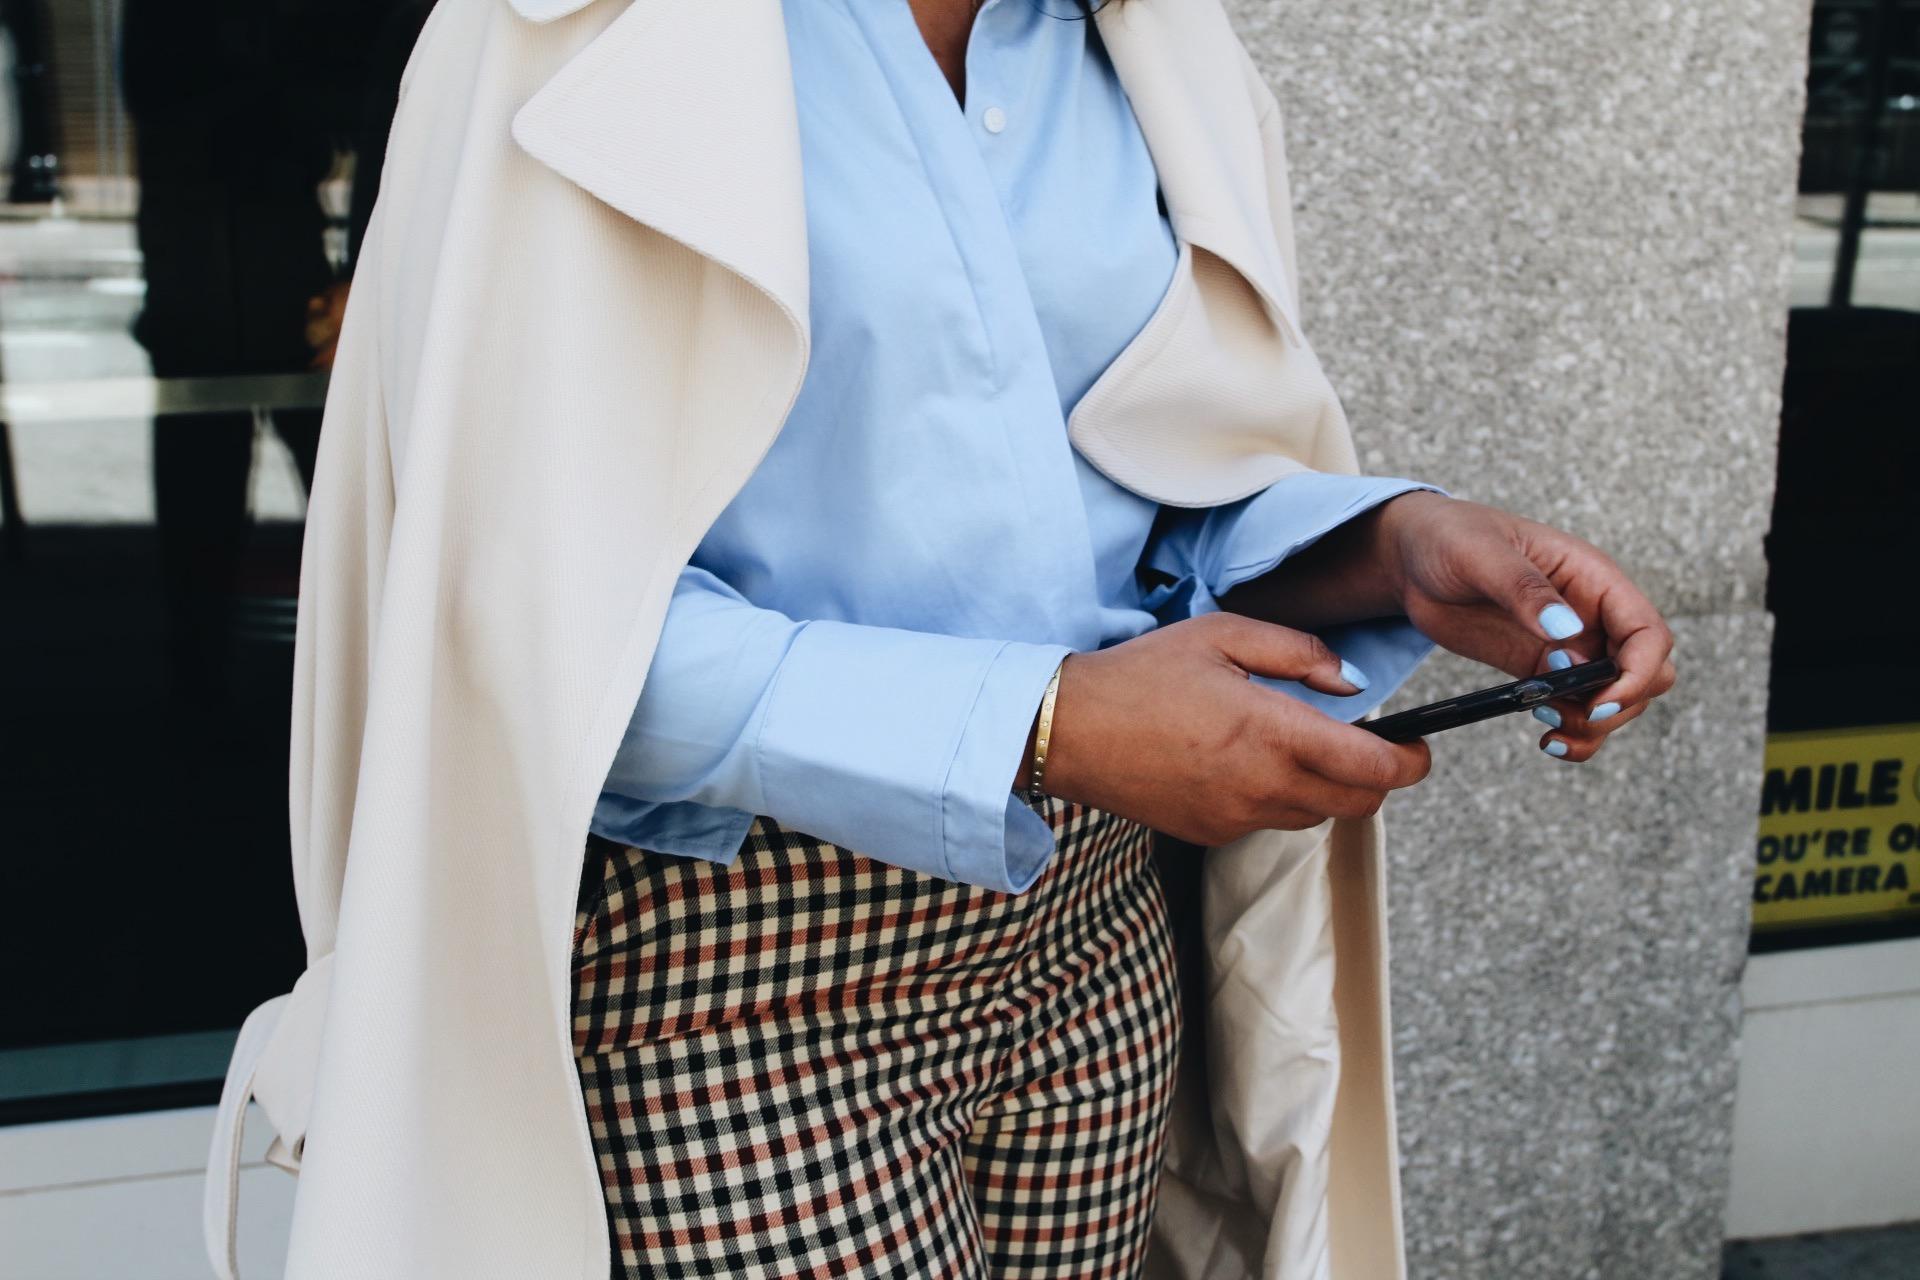 My-fave-iphone-apps-asos-plaid-pant-zara-blouse-steve-madden-daisie-pumps-asos-coat-2.JPG